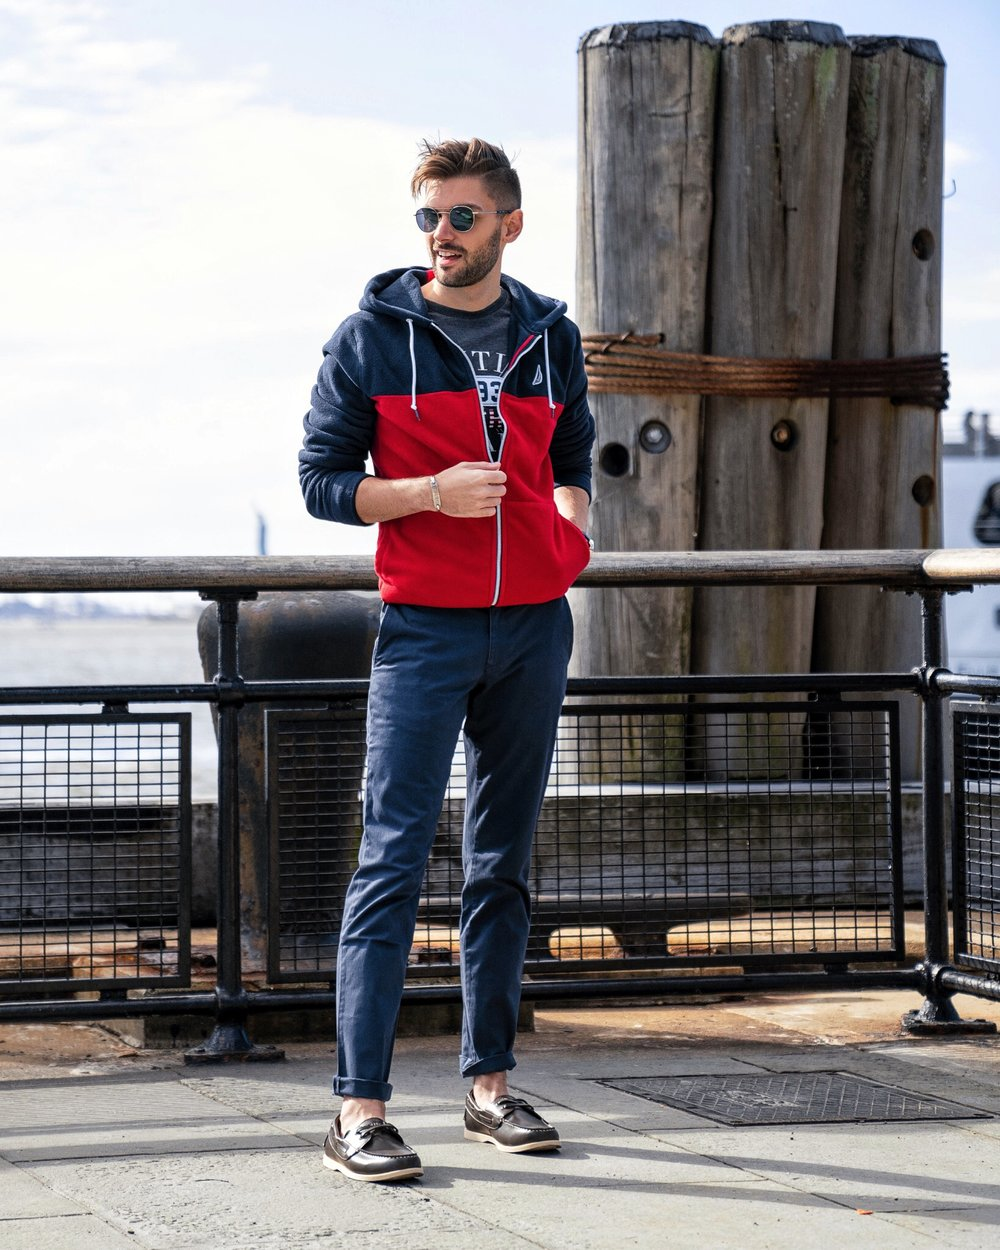 Nautica and Amazon Fashion | The Modern Otter | www.amazon.com/shop/themodernotter